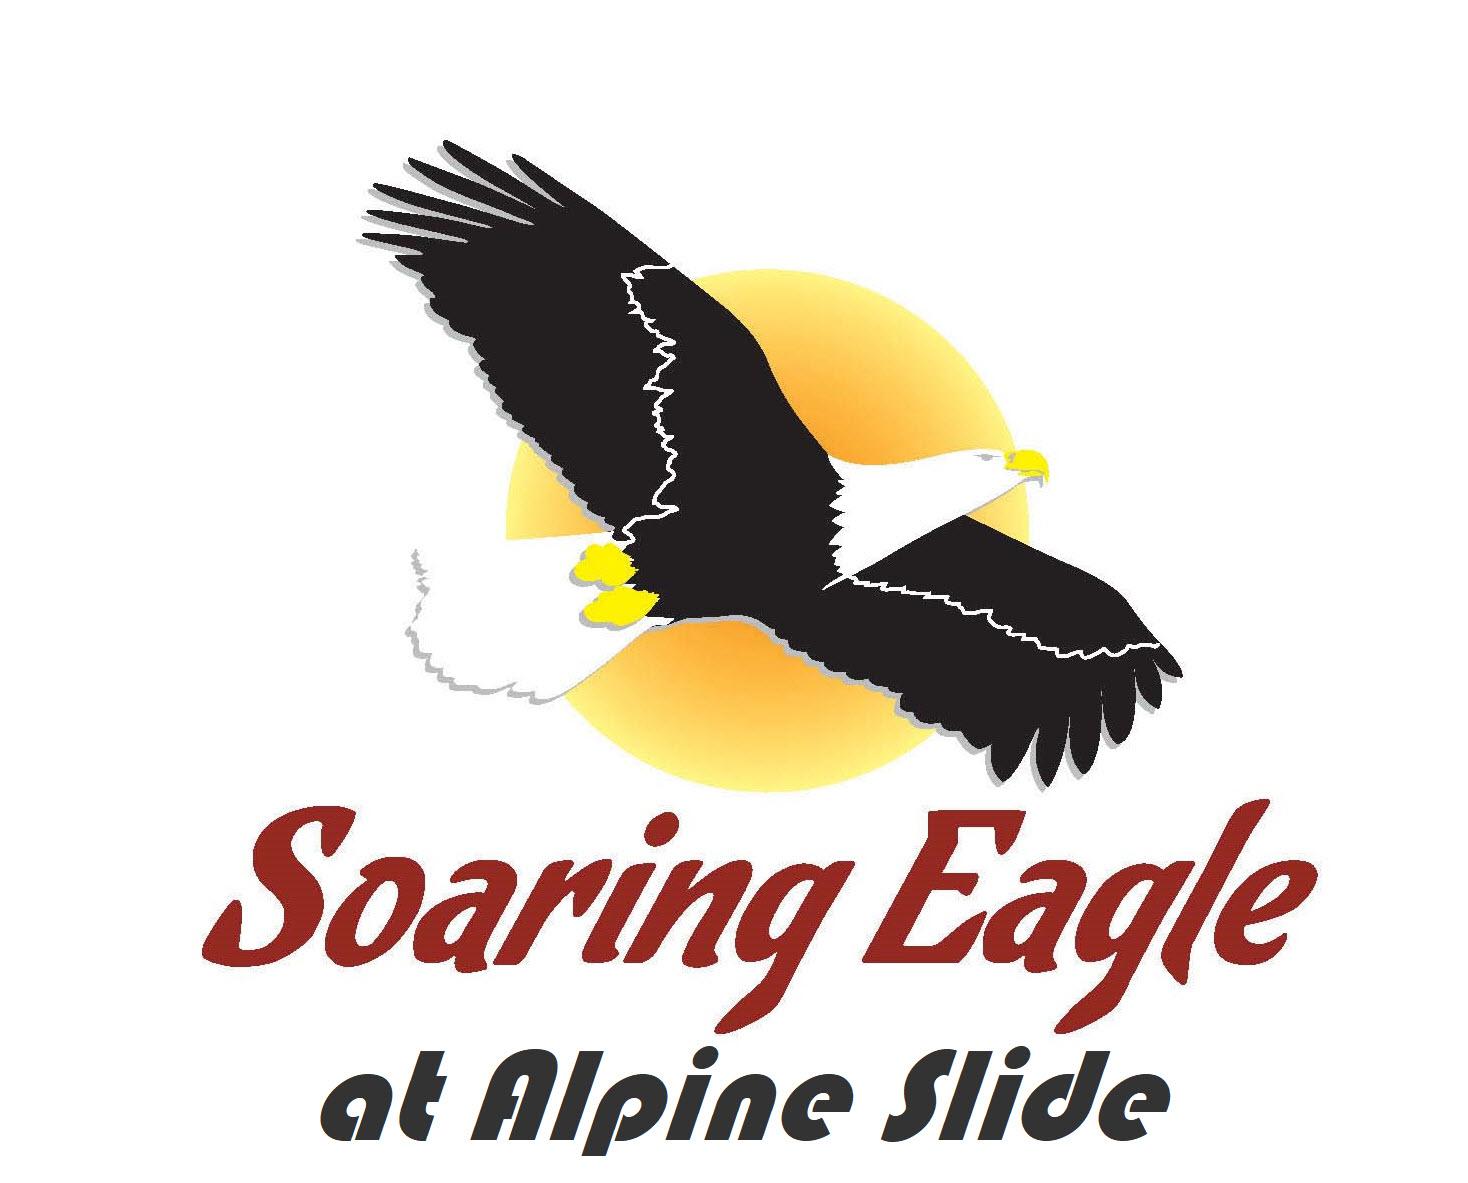 Big Bear Bald Eagle Nest | Friends of Big Bear Valley